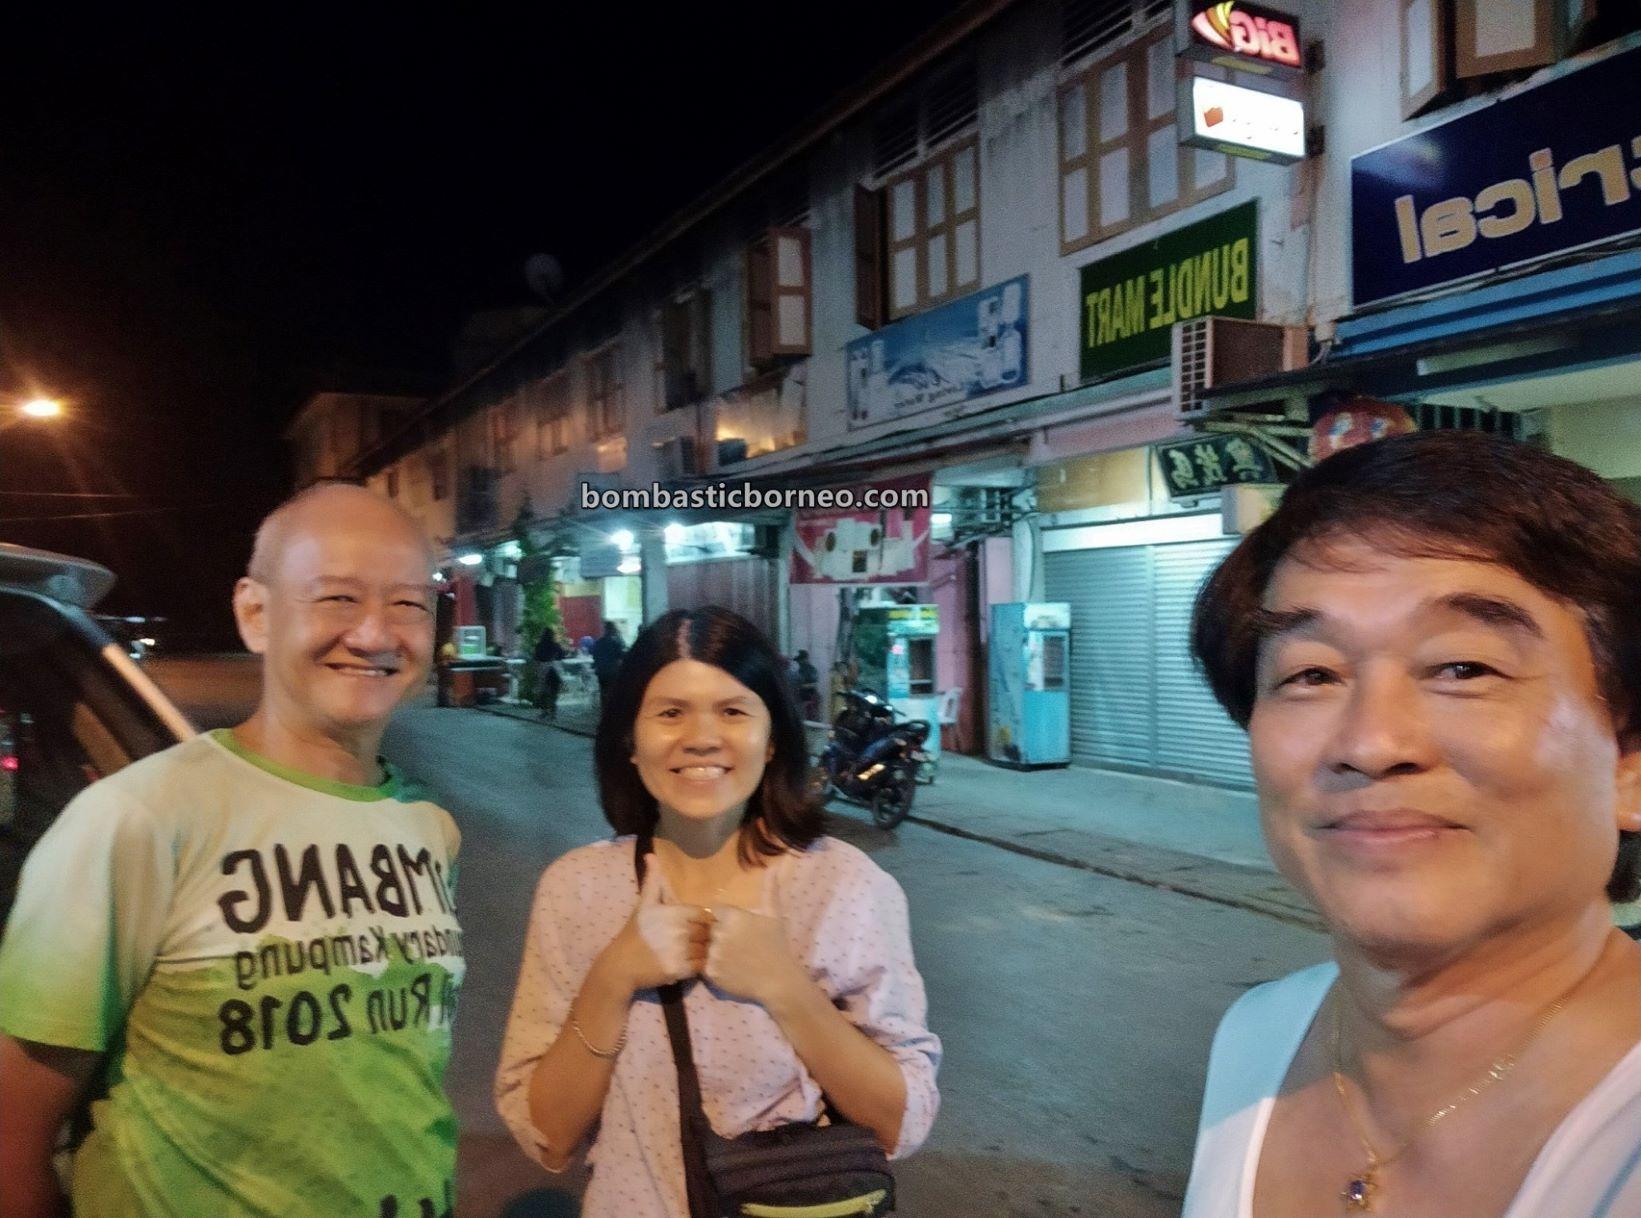 local market, night street market, exploration, Tourism, tourist attraction, travel guide, 探索婆罗洲游踪, 砂拉越林梦